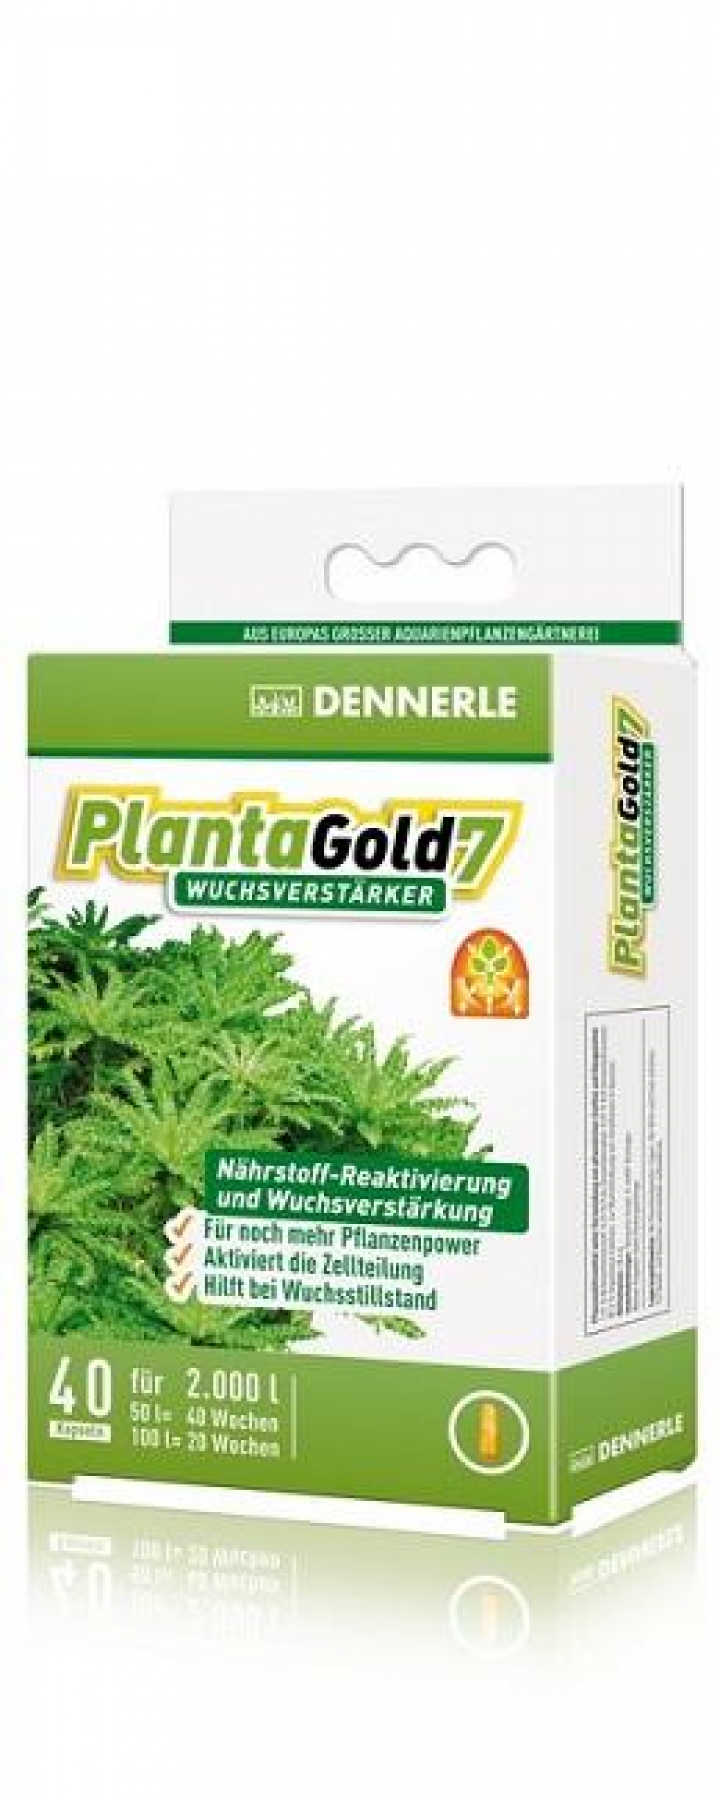 Dennerle - Plantagold 7 10pcs